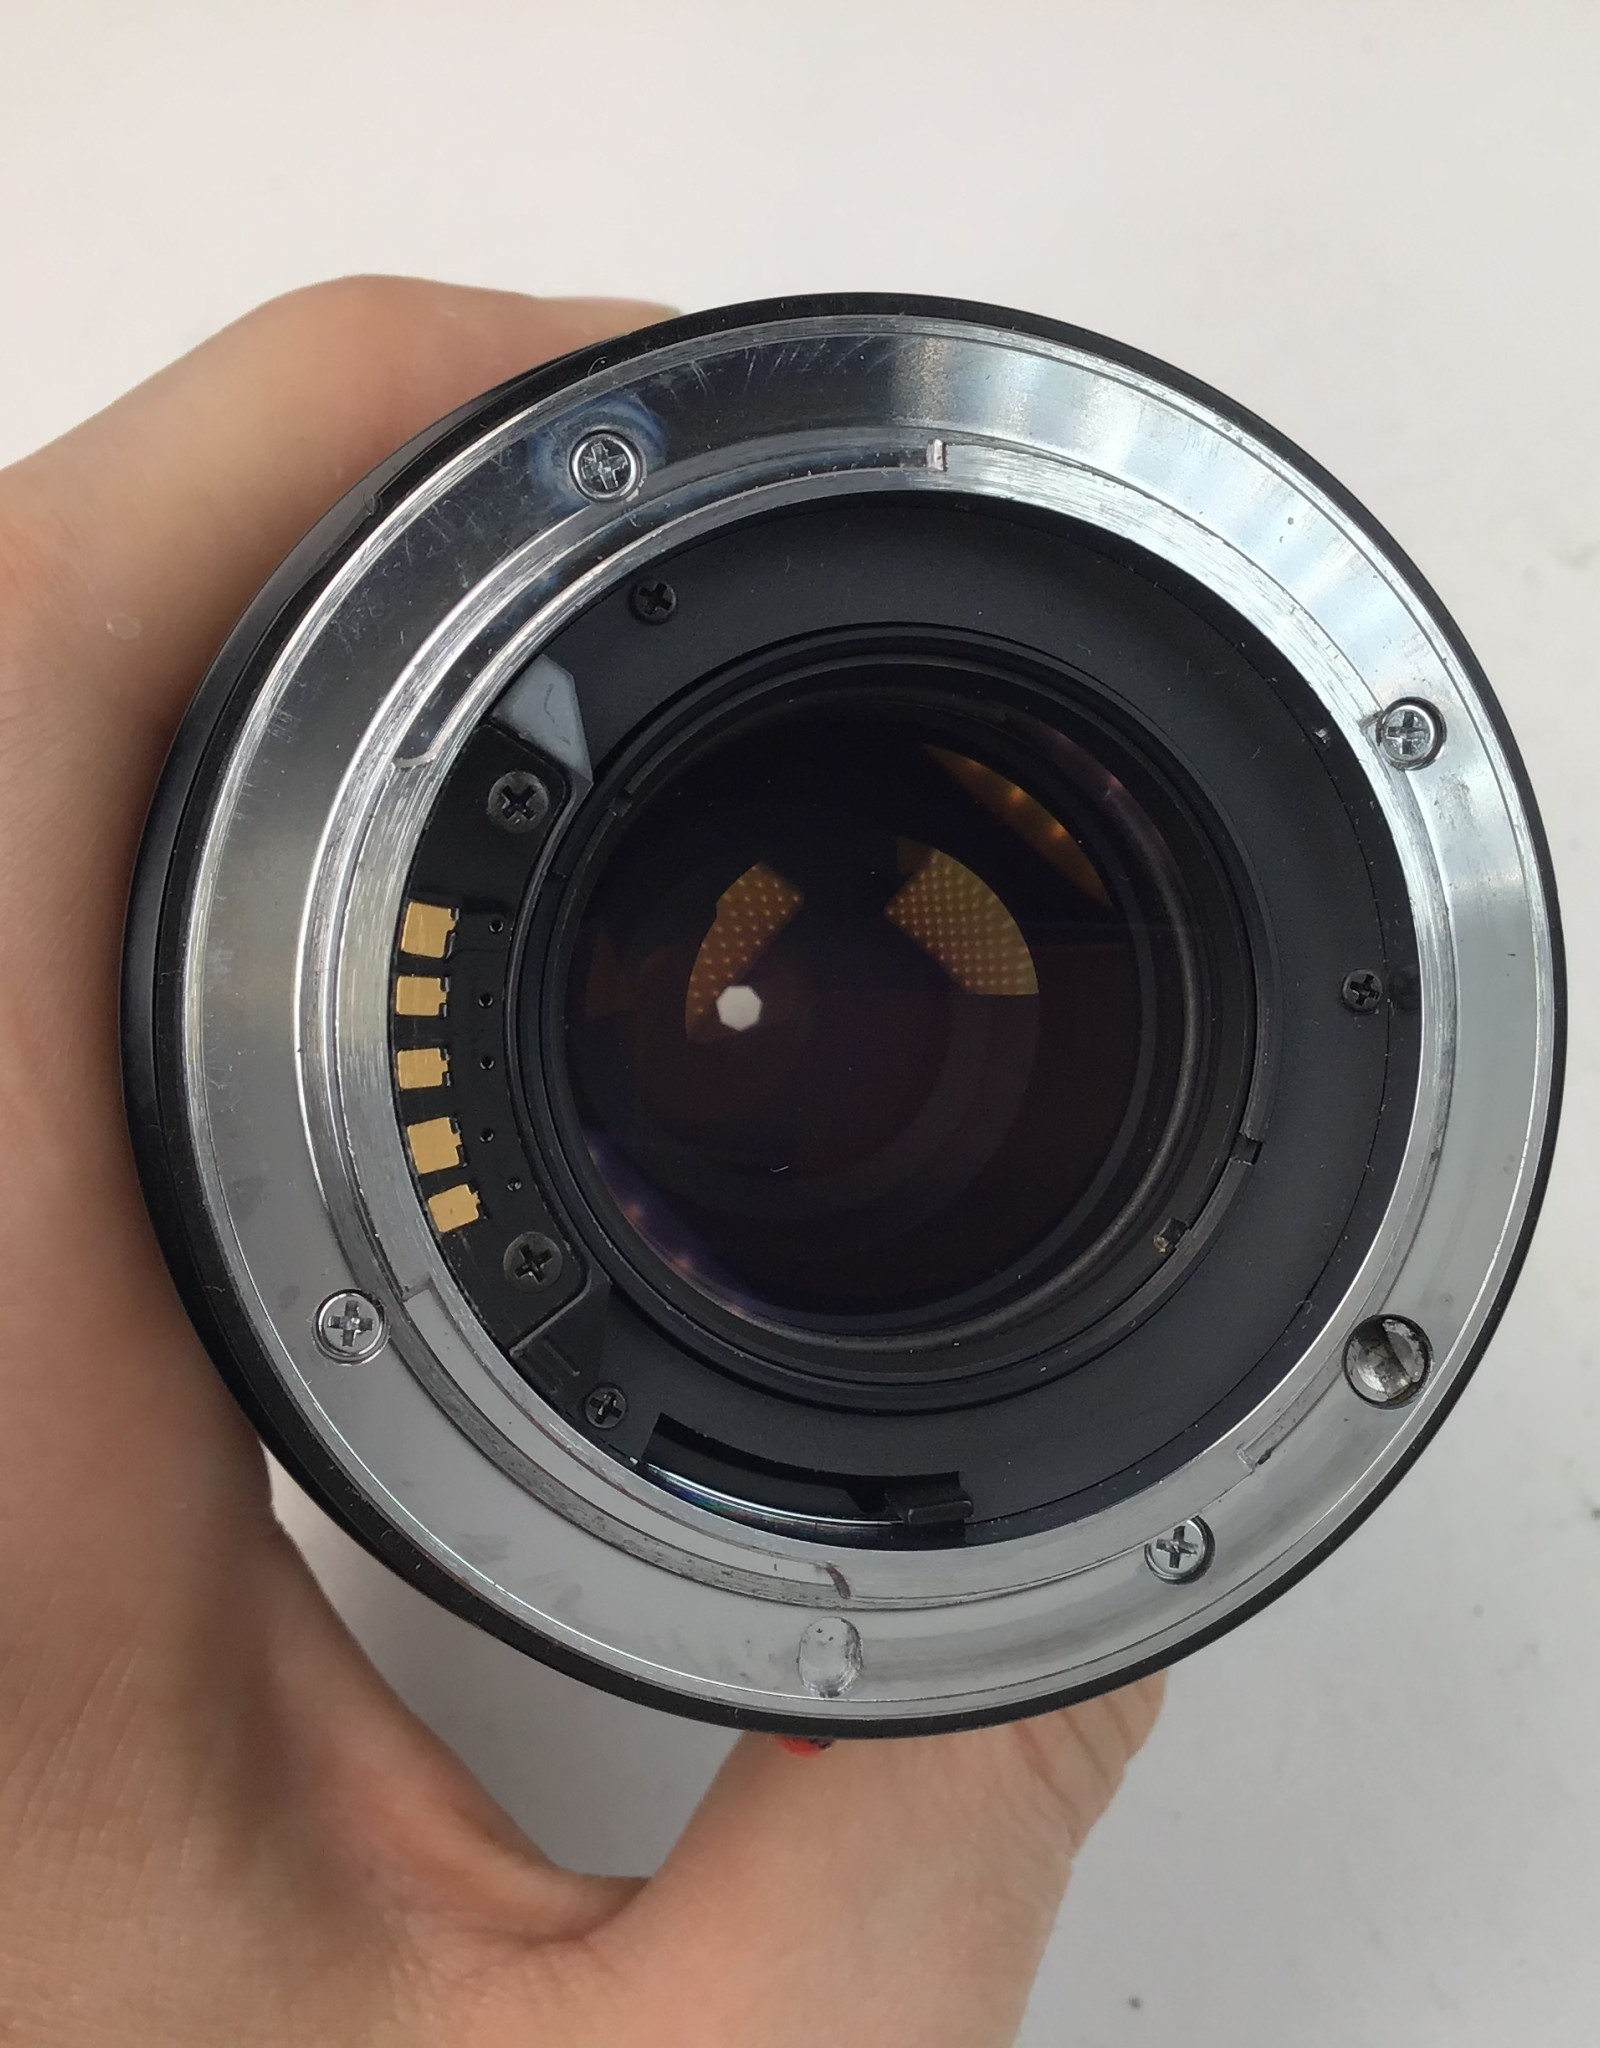 Minolta Minolta Maxxum AF 70-200mm f4 Lens Used Fair